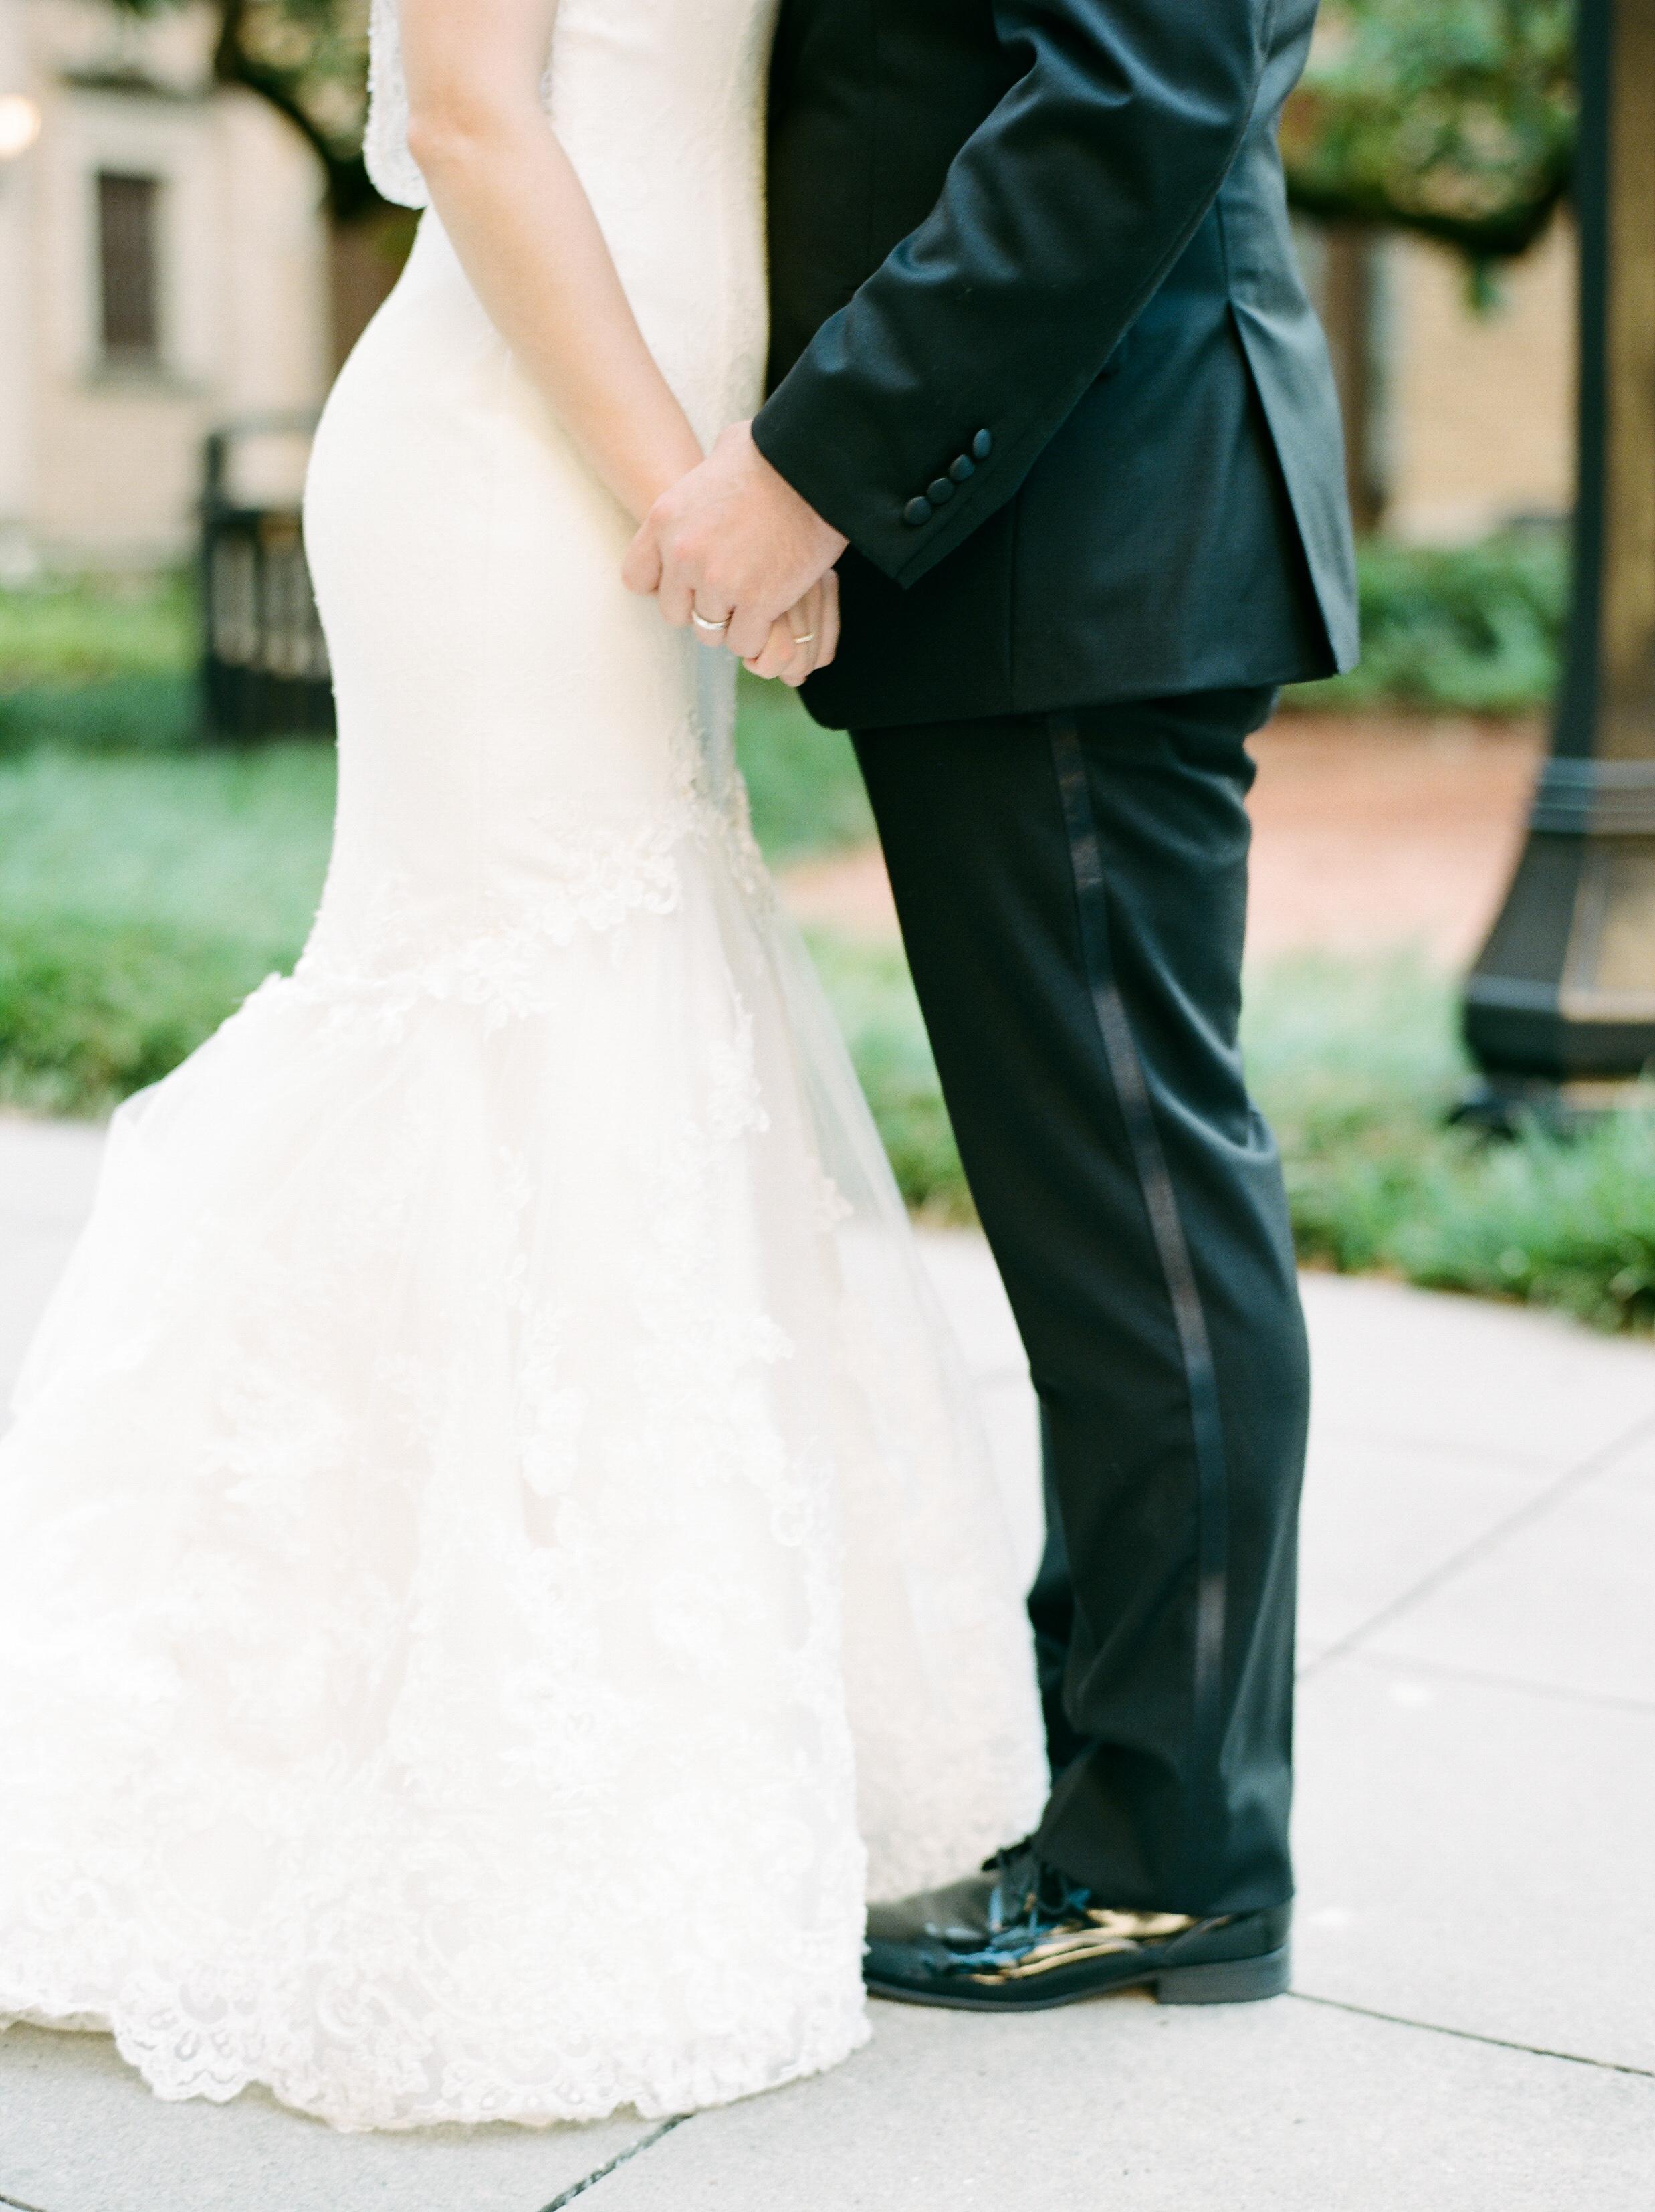 The-Knot-Texas-Fine-Art-Wedding-Film-Destination-Photographer-Houston-Austin-Dallas-New-Orleans-Julia-Ideson-Library-Event-Dana-Josh-Fernandez-Photograph-Top-Best-43.jpg